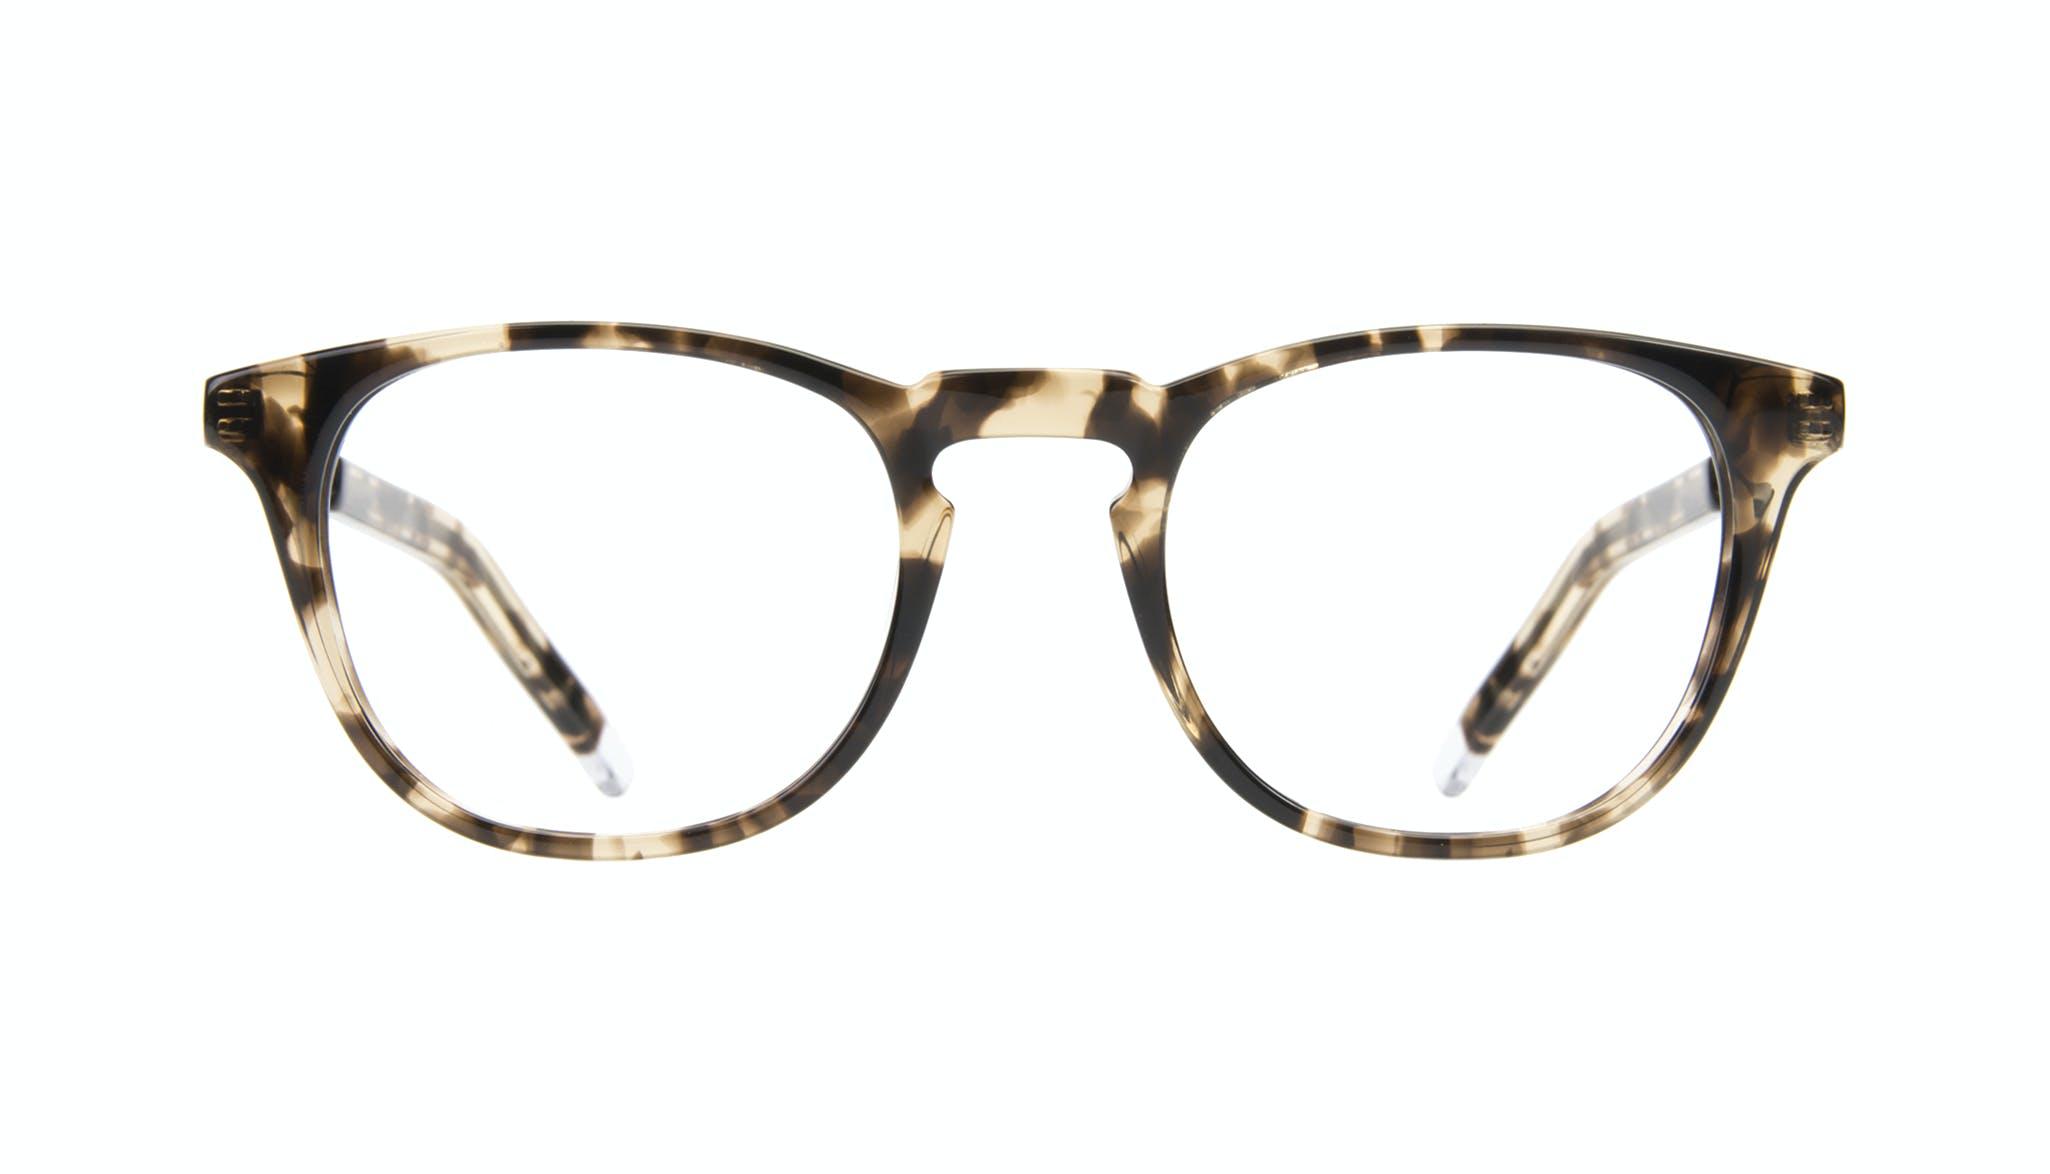 Affordable Fashion Glasses Rectangle Square Eyeglasses Men Sturdy Gold Tort Front